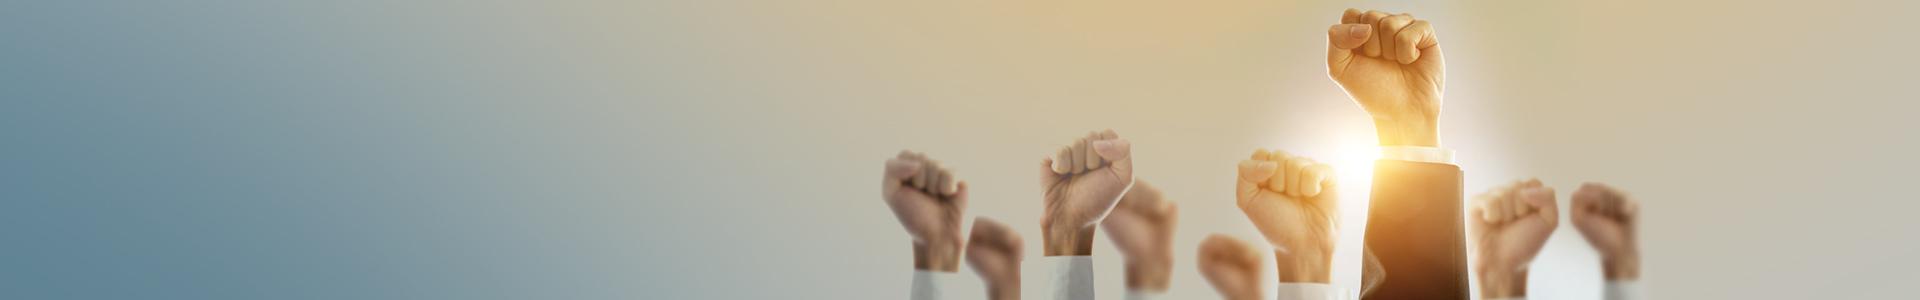 Hire The Most Efficient Management Consultancy in Brisbane